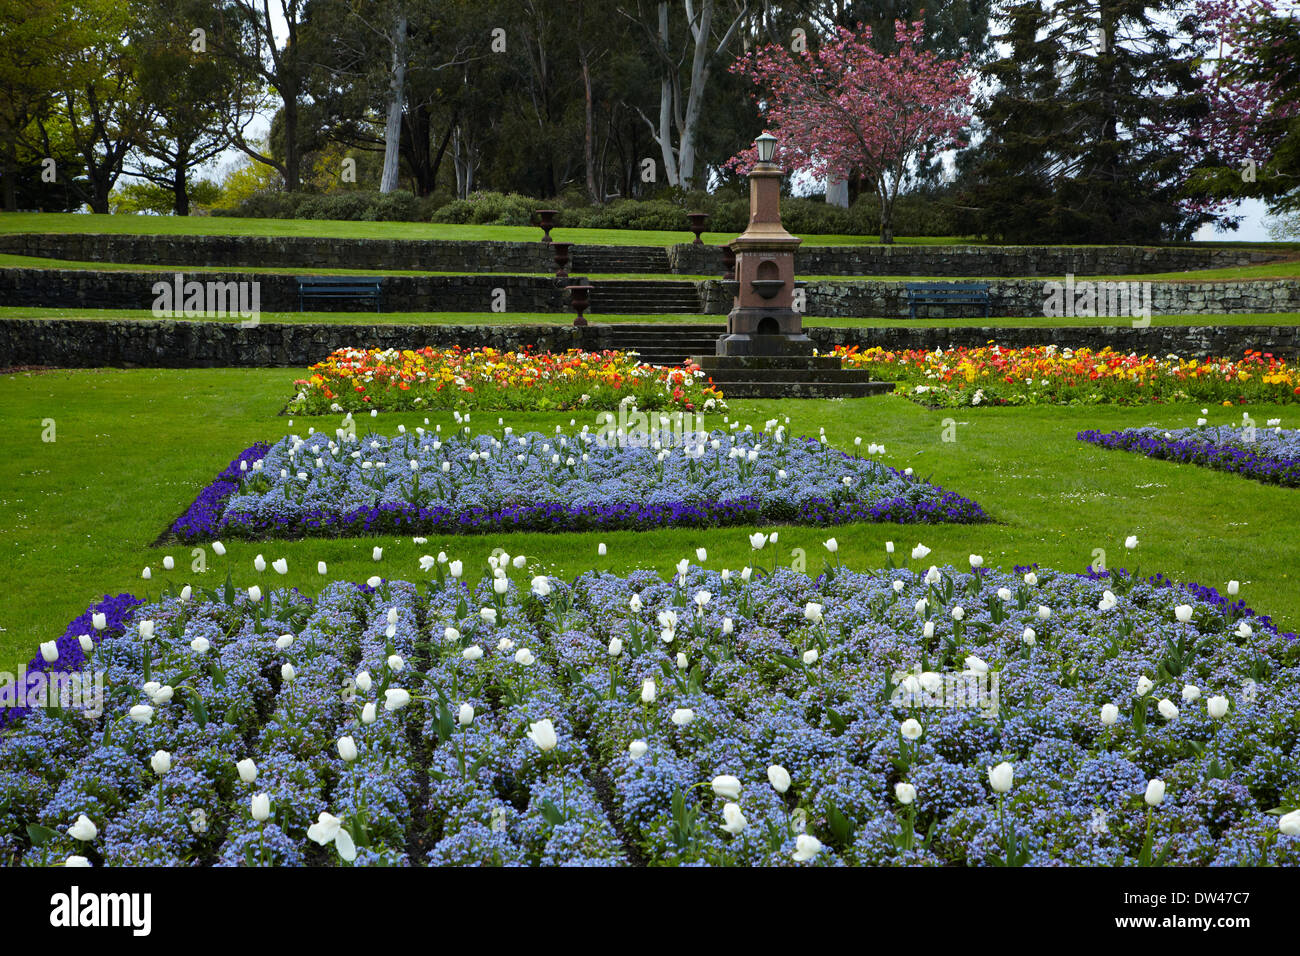 Garden Spring Flowers Nz Garden Ftempo